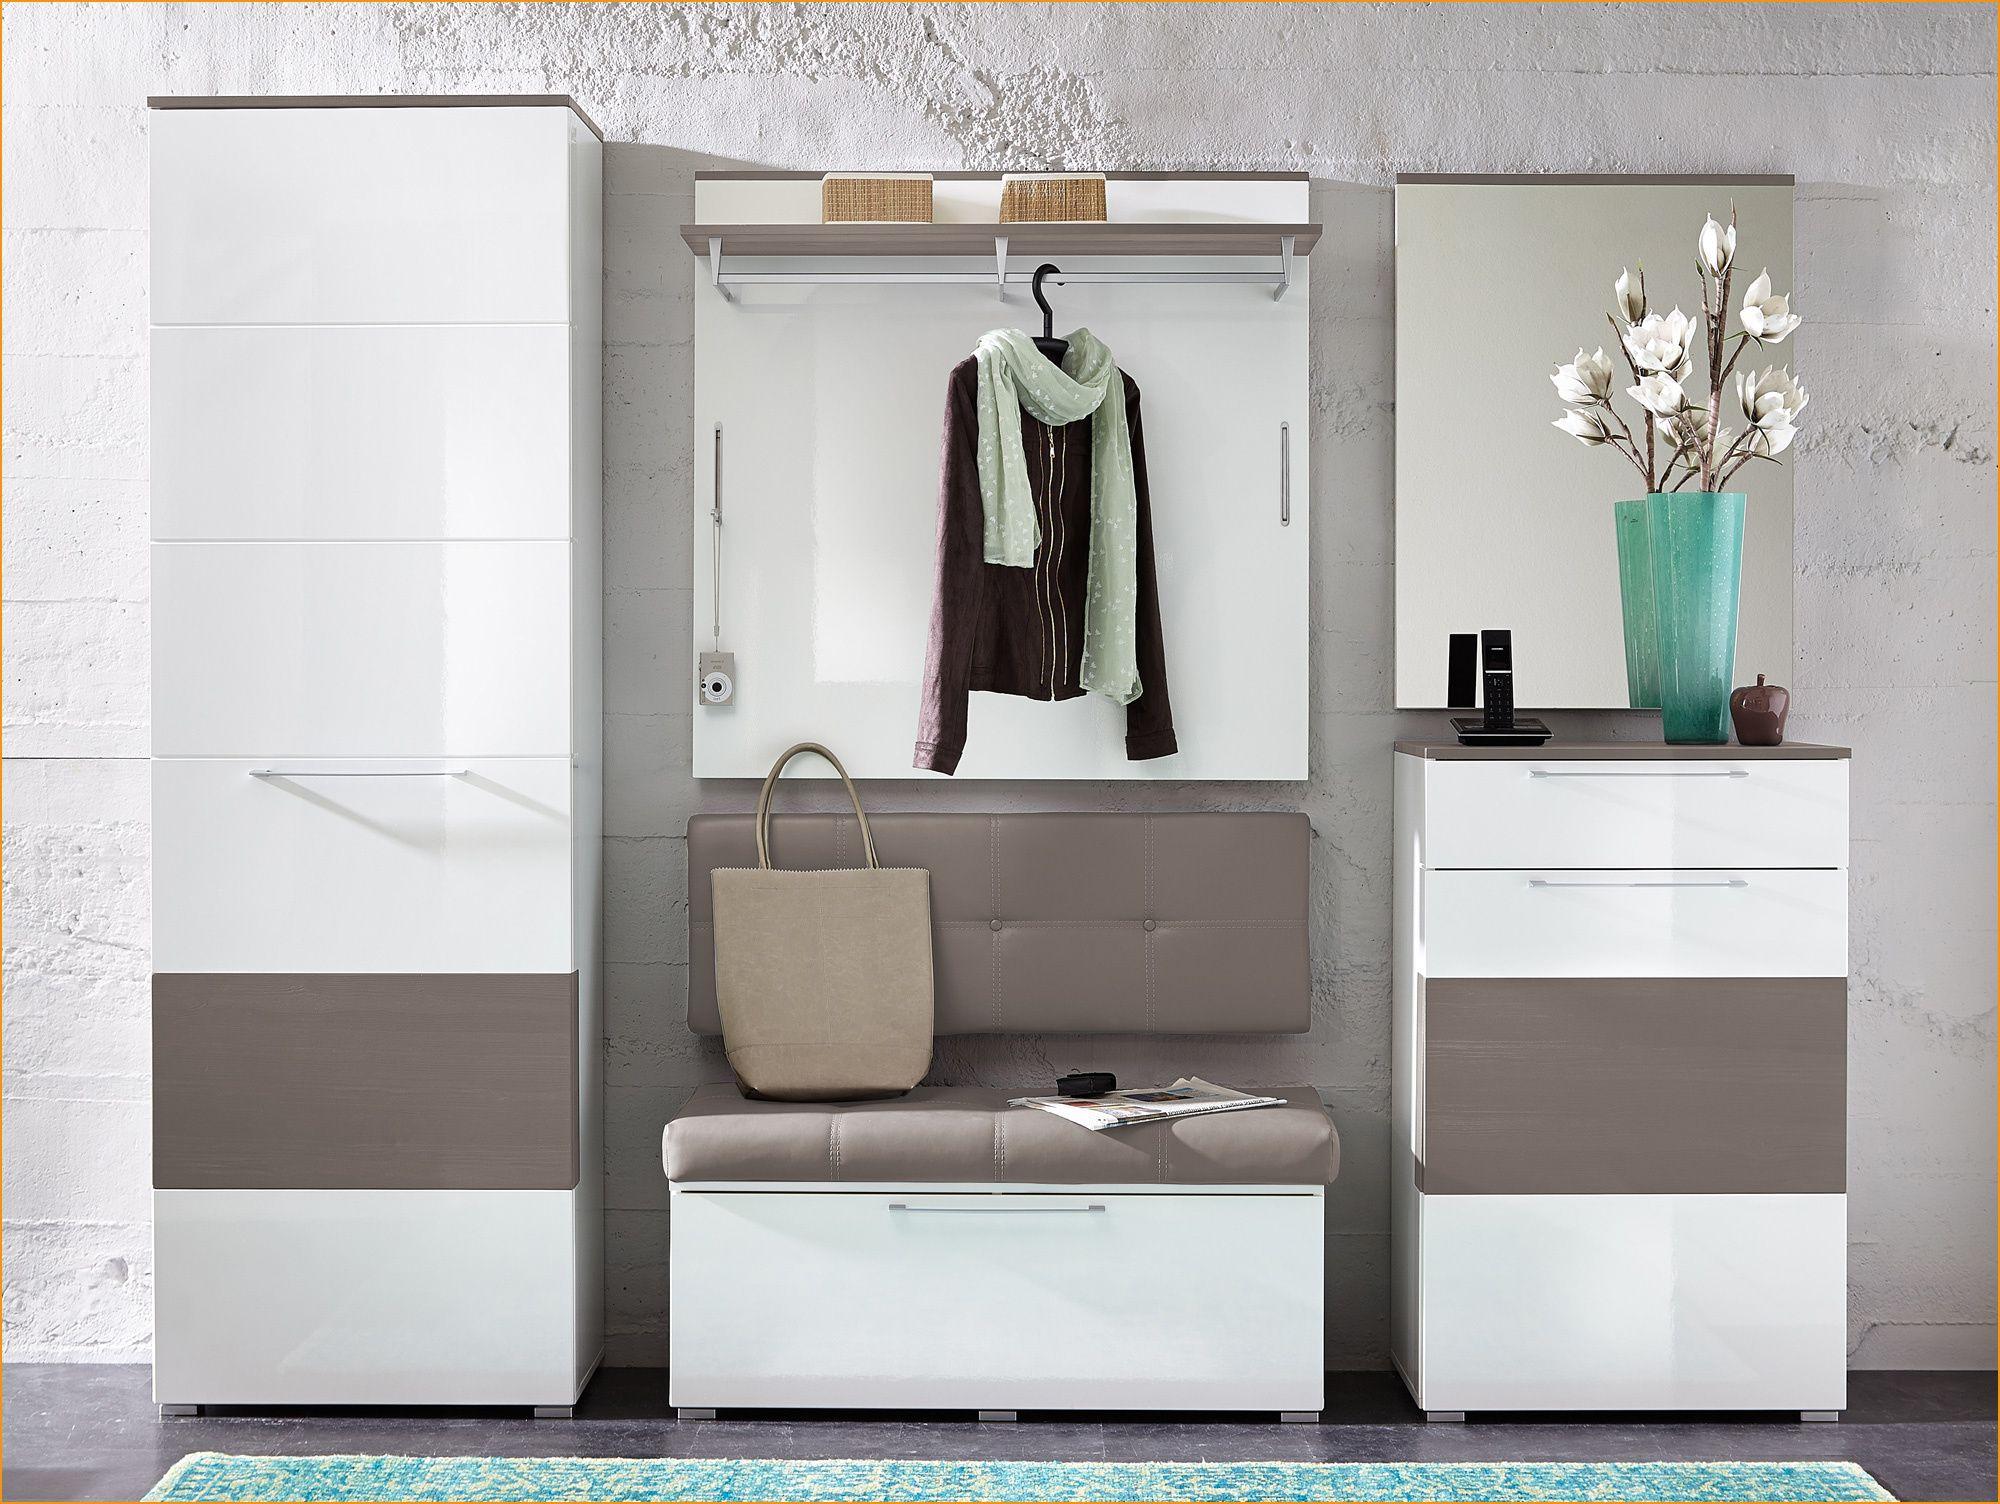 Rene Garderobenpaneel Weiss Hochglanz In 2020 Furniture Shoe